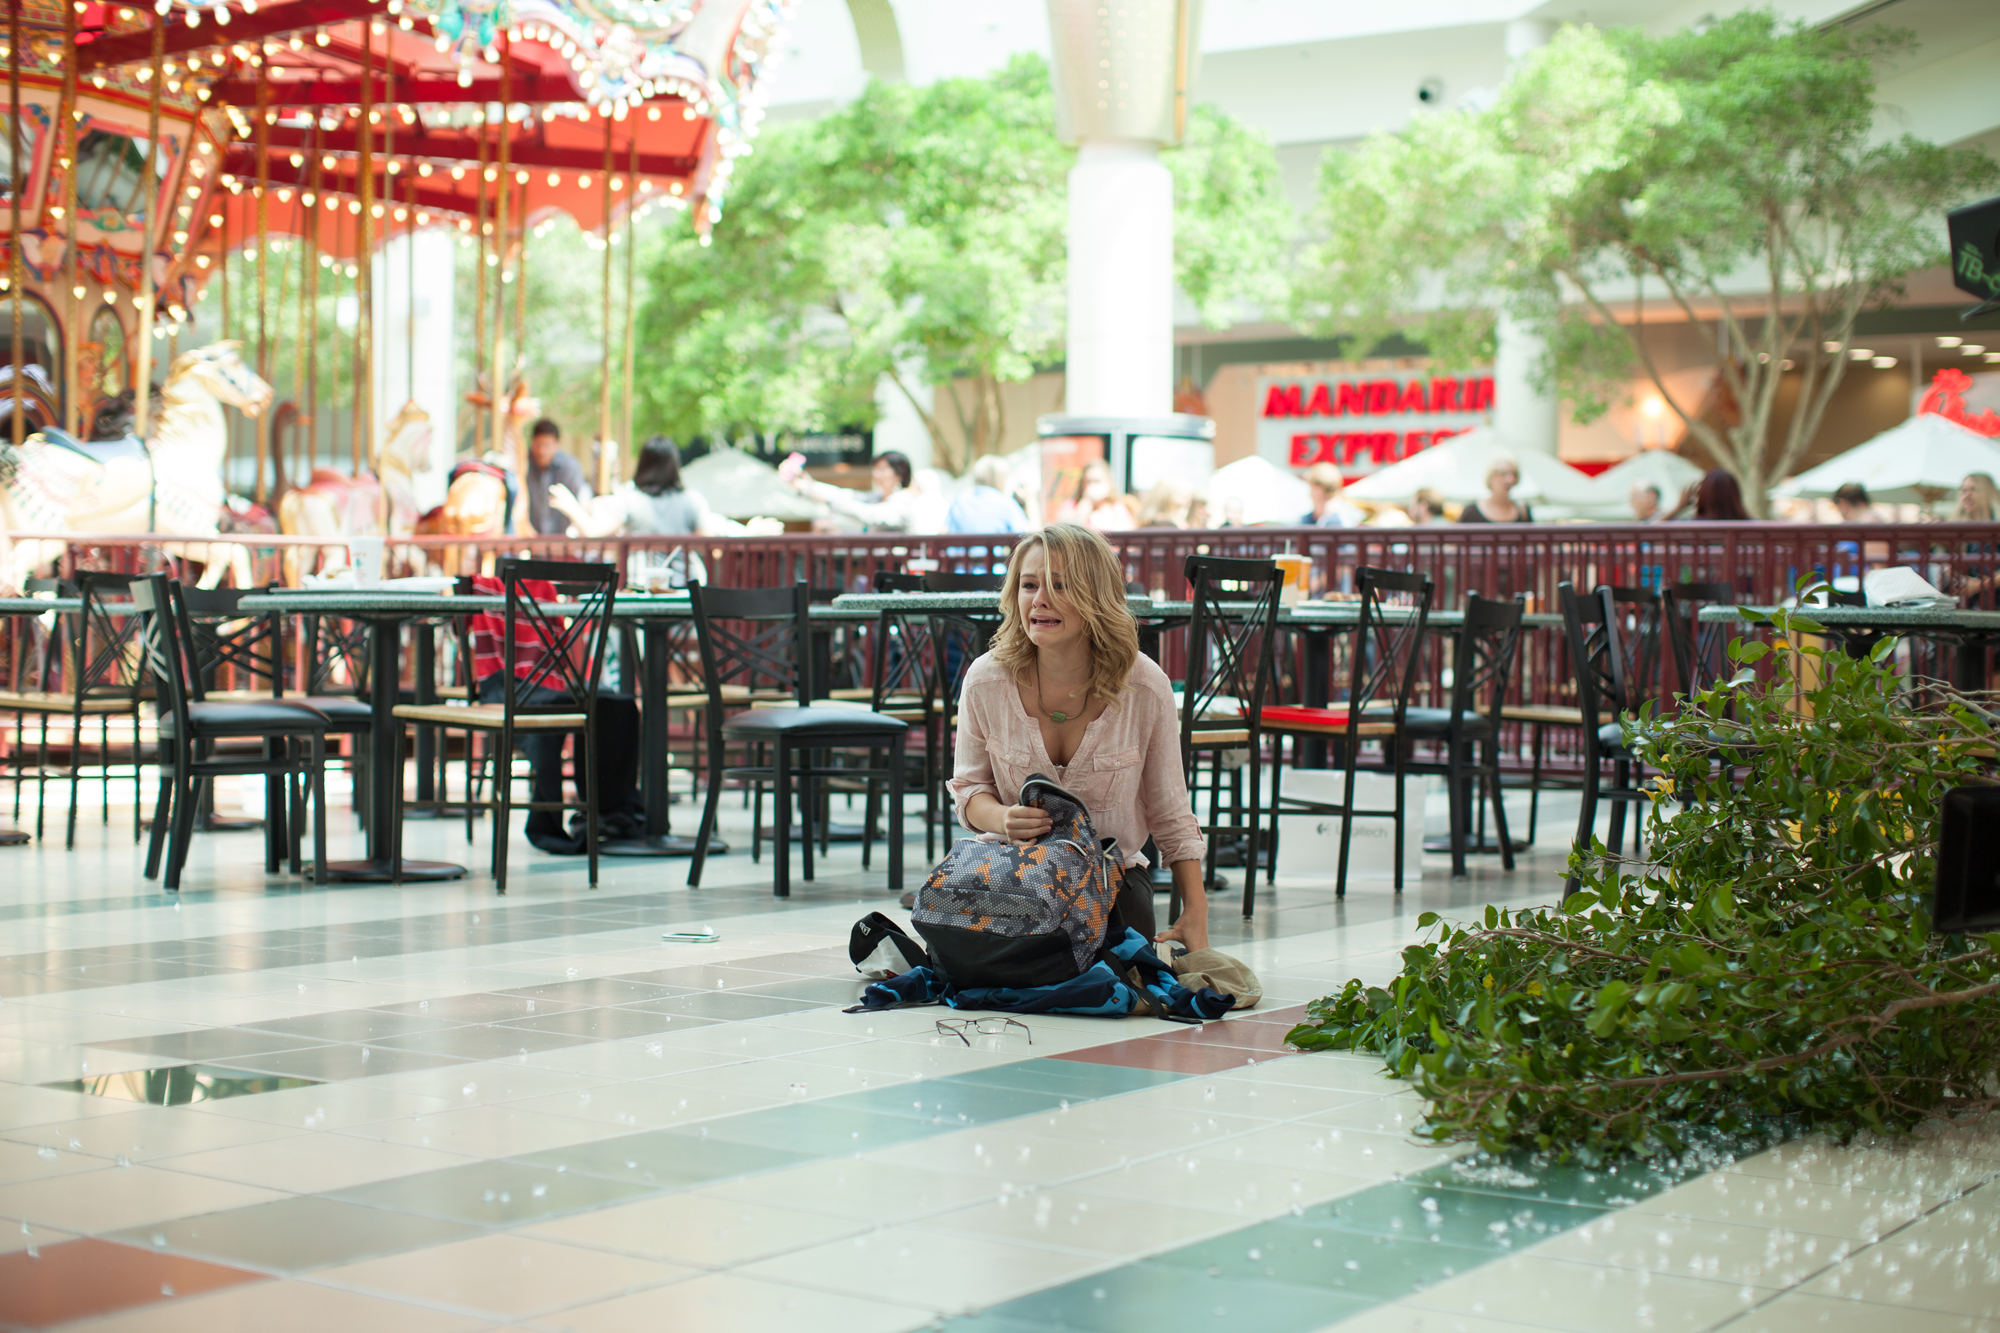 Cassi Thomson in Left Behind (2014)